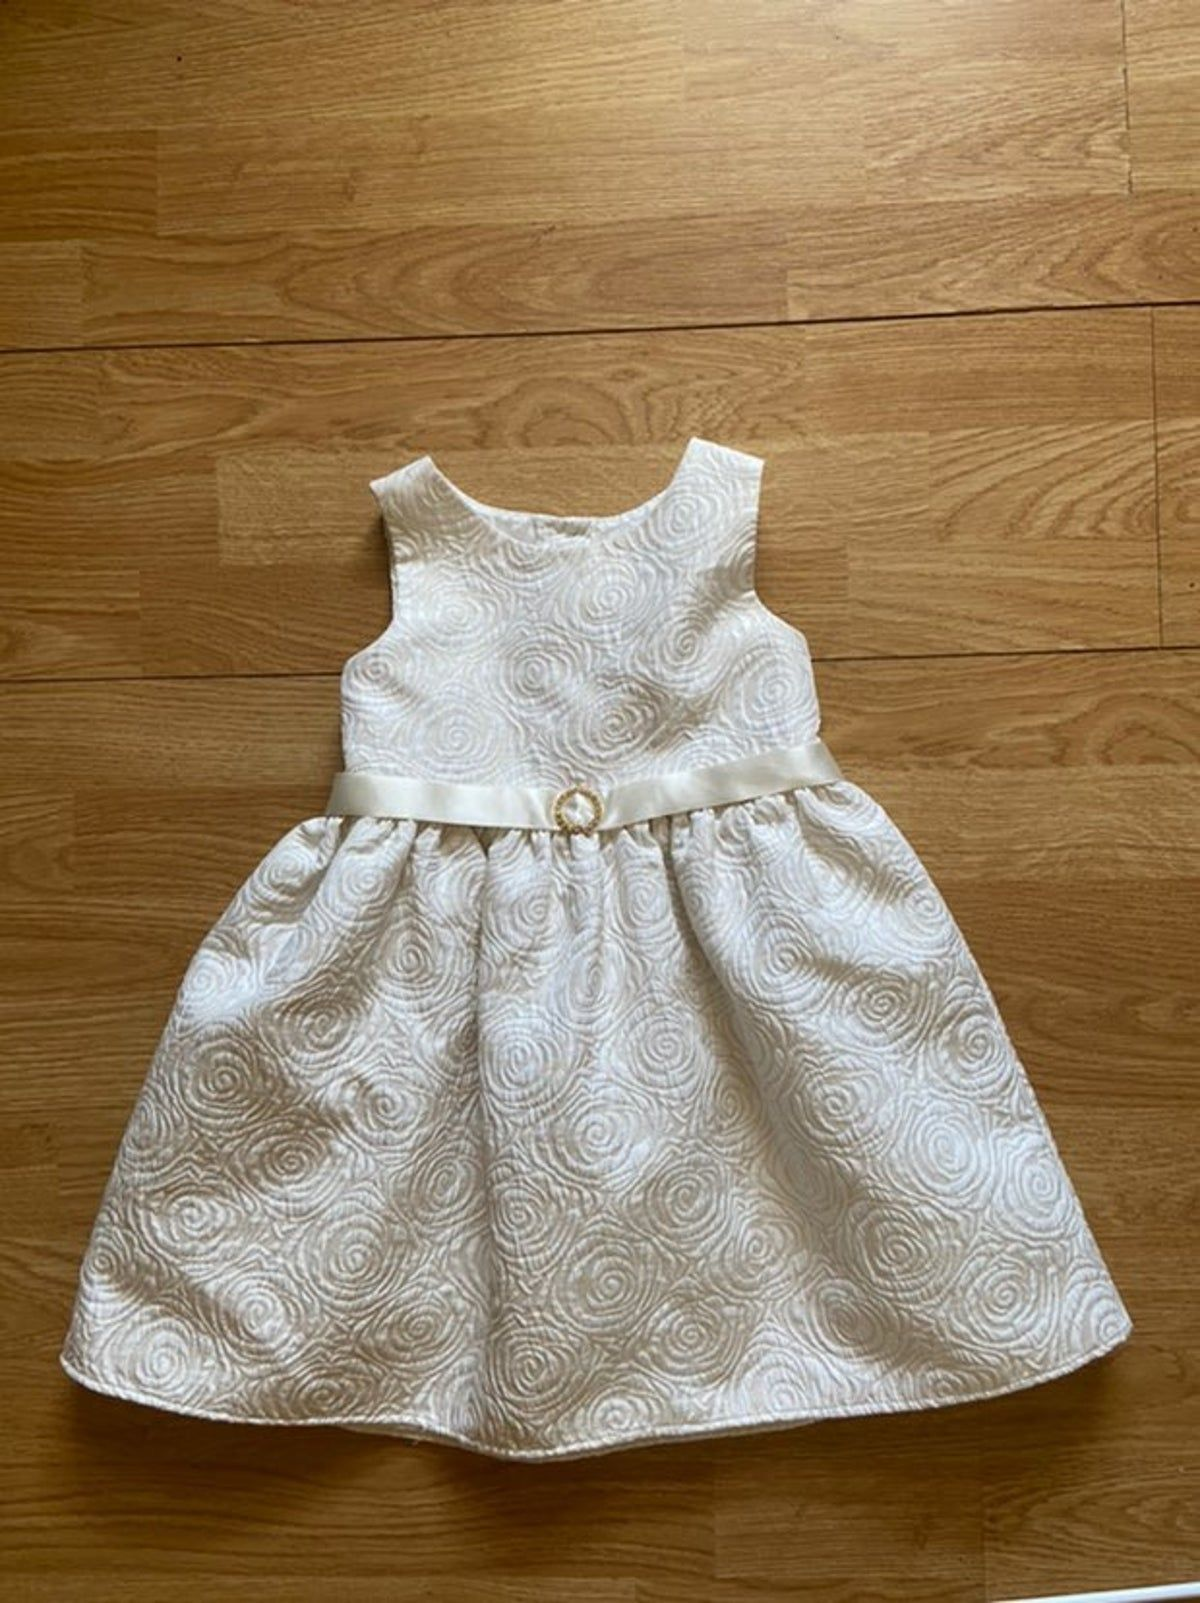 Pin By Amala Thomas On Baptism Dress Dresses Cute Dresses Summer Dresses [ 1603 x 1200 Pixel ]